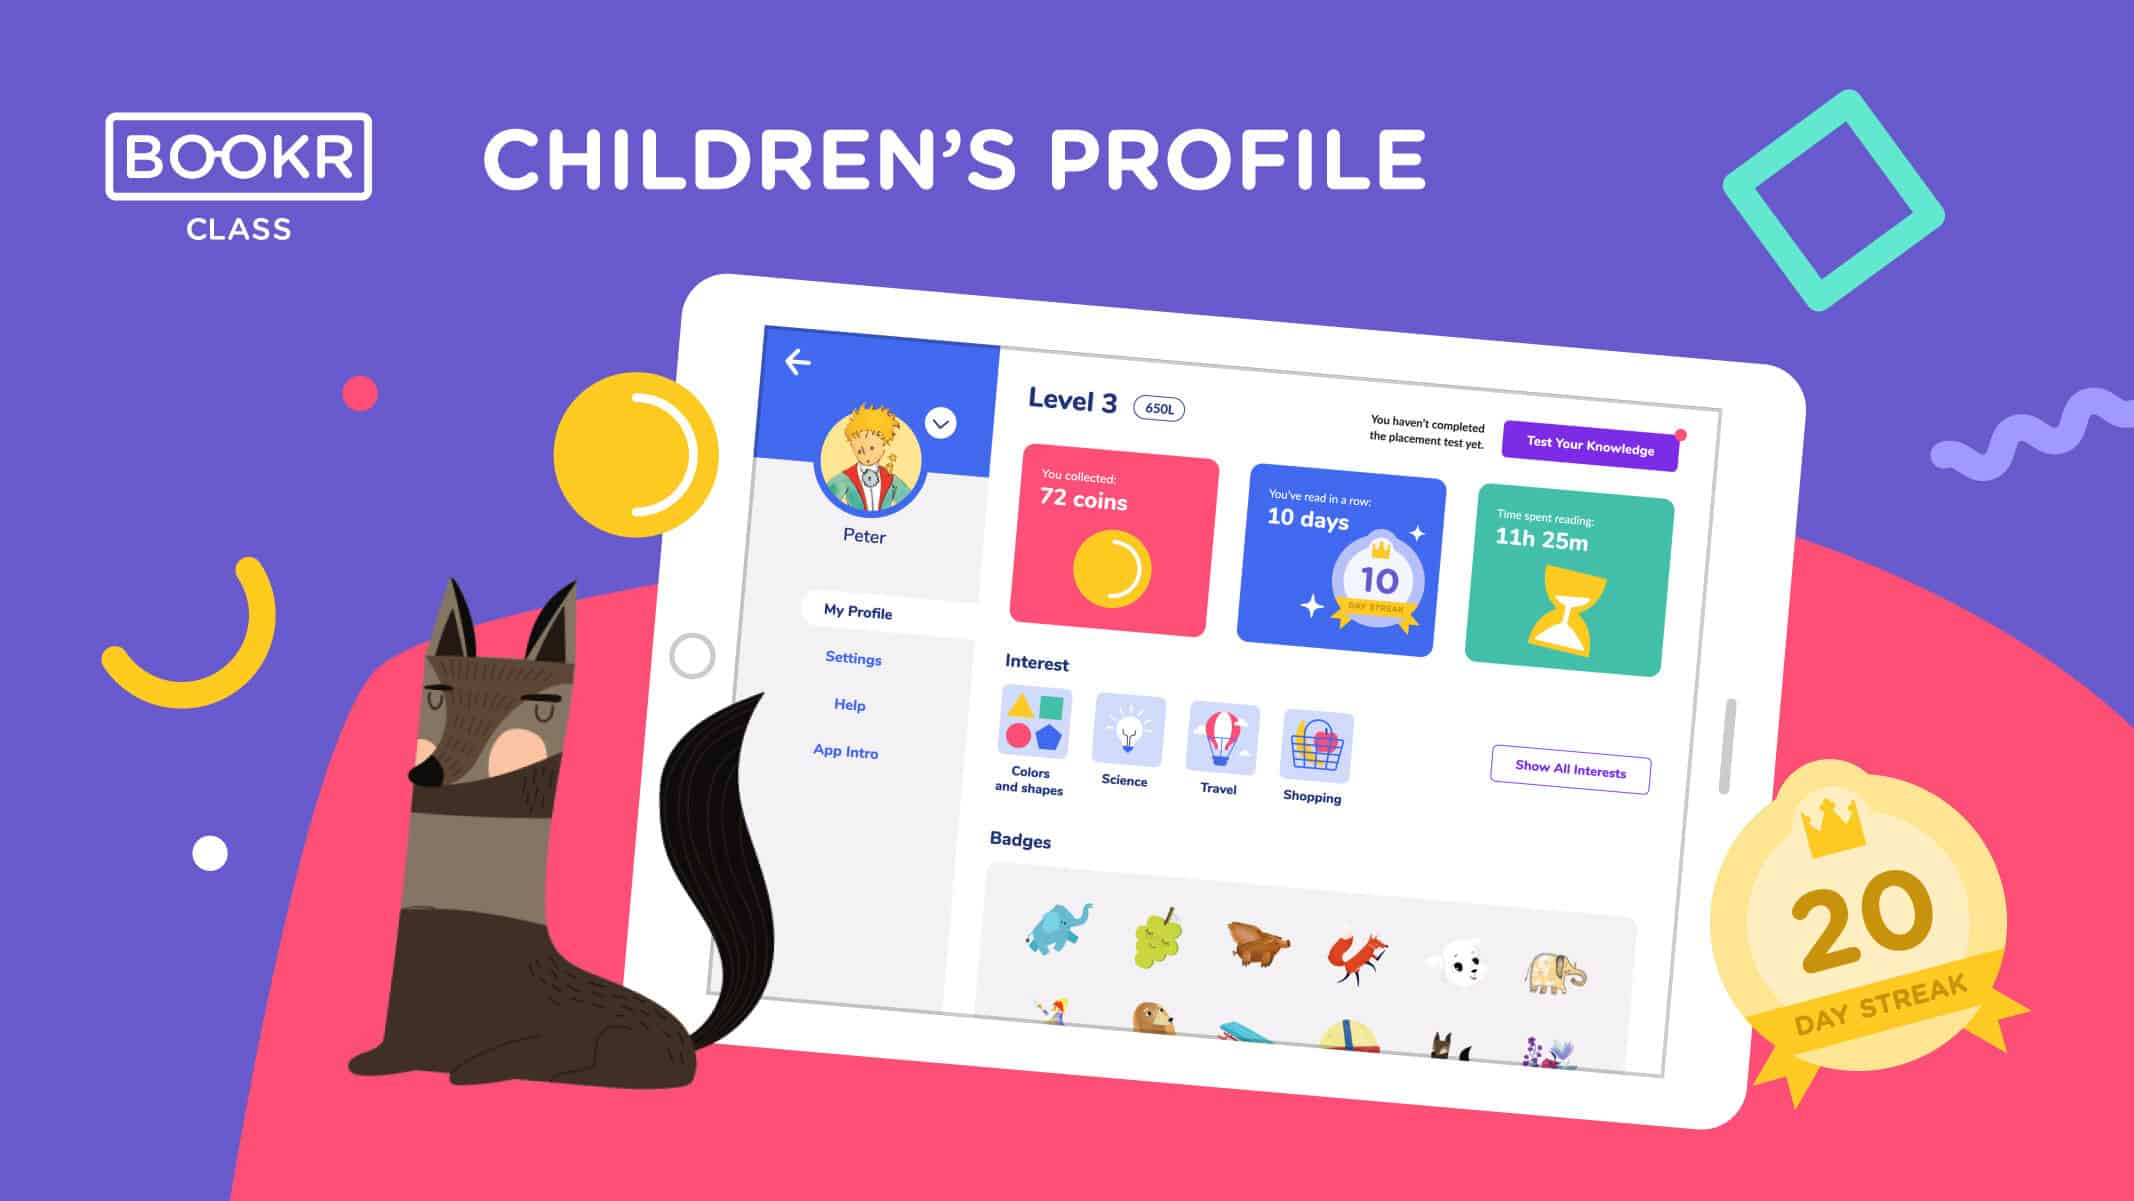 childrens_profile_bookrclass